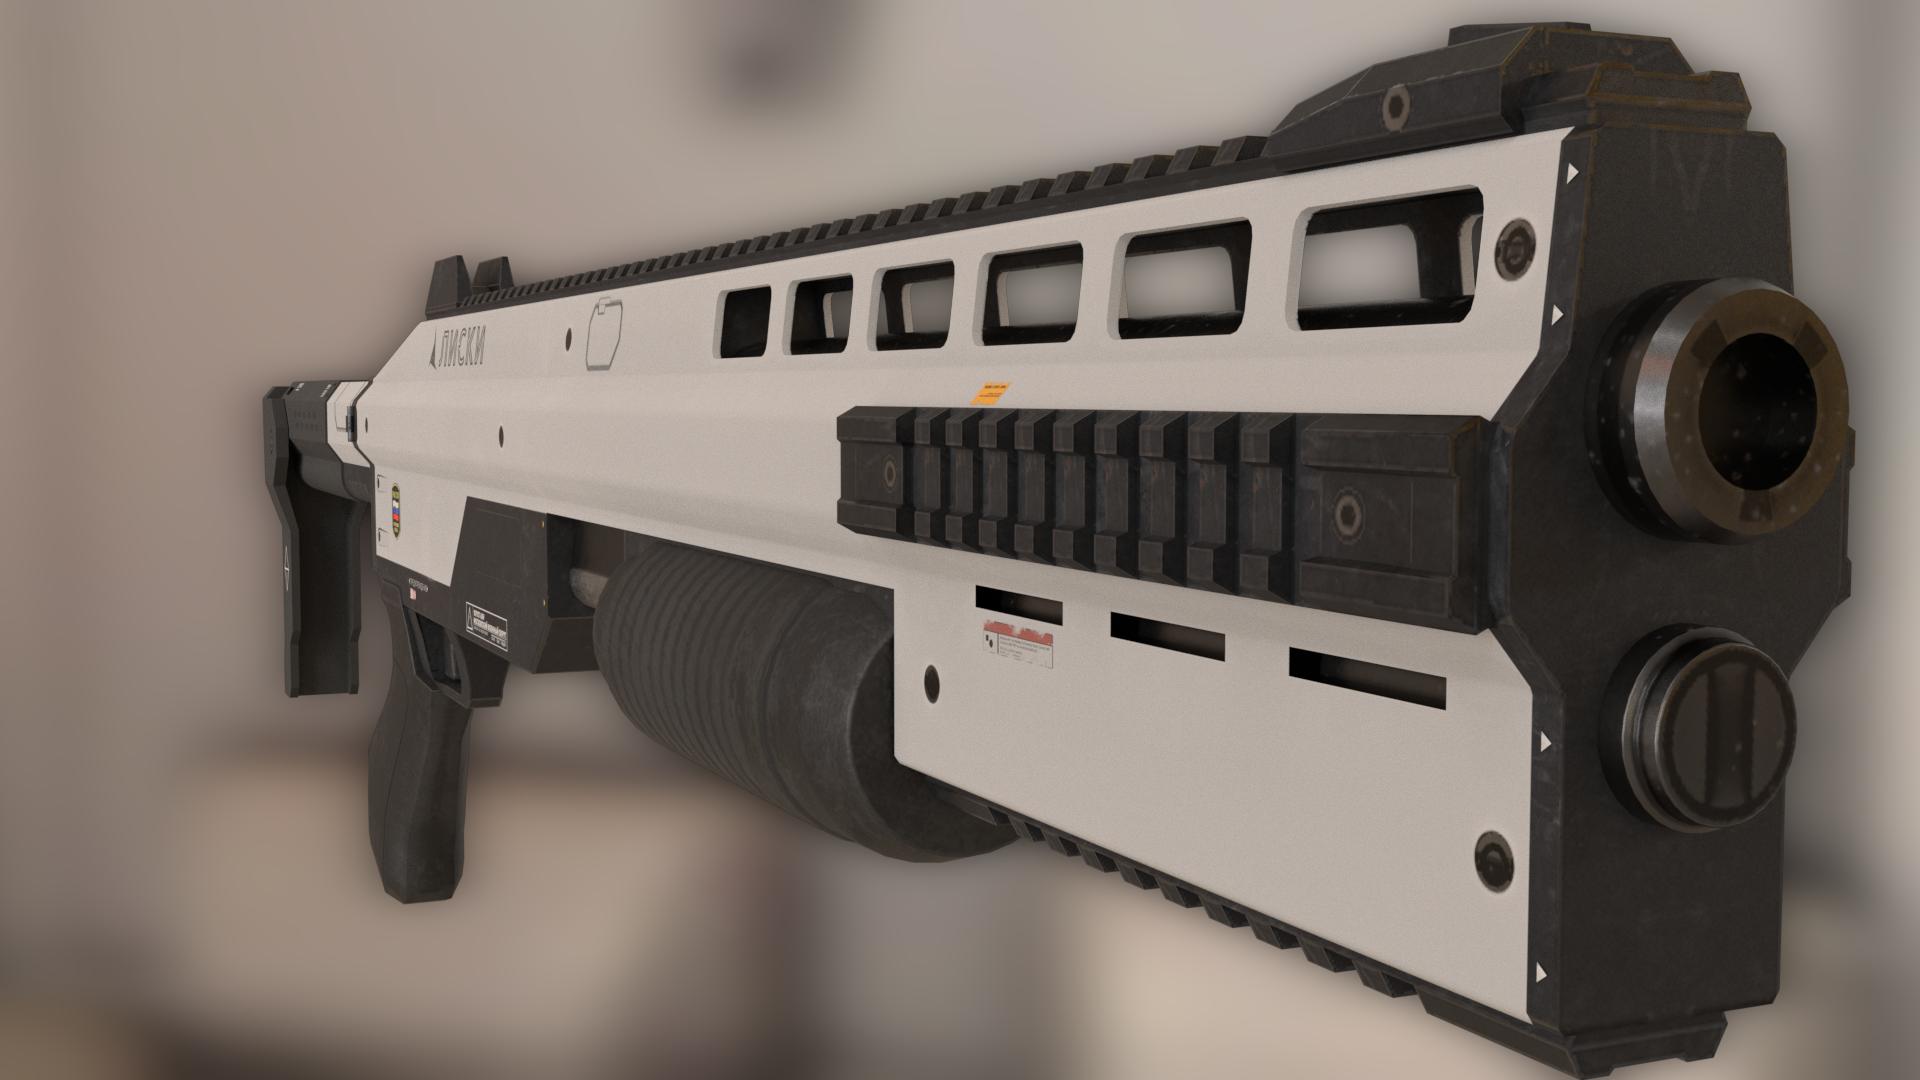 (Coming soon) - Mjolnir Shotgun